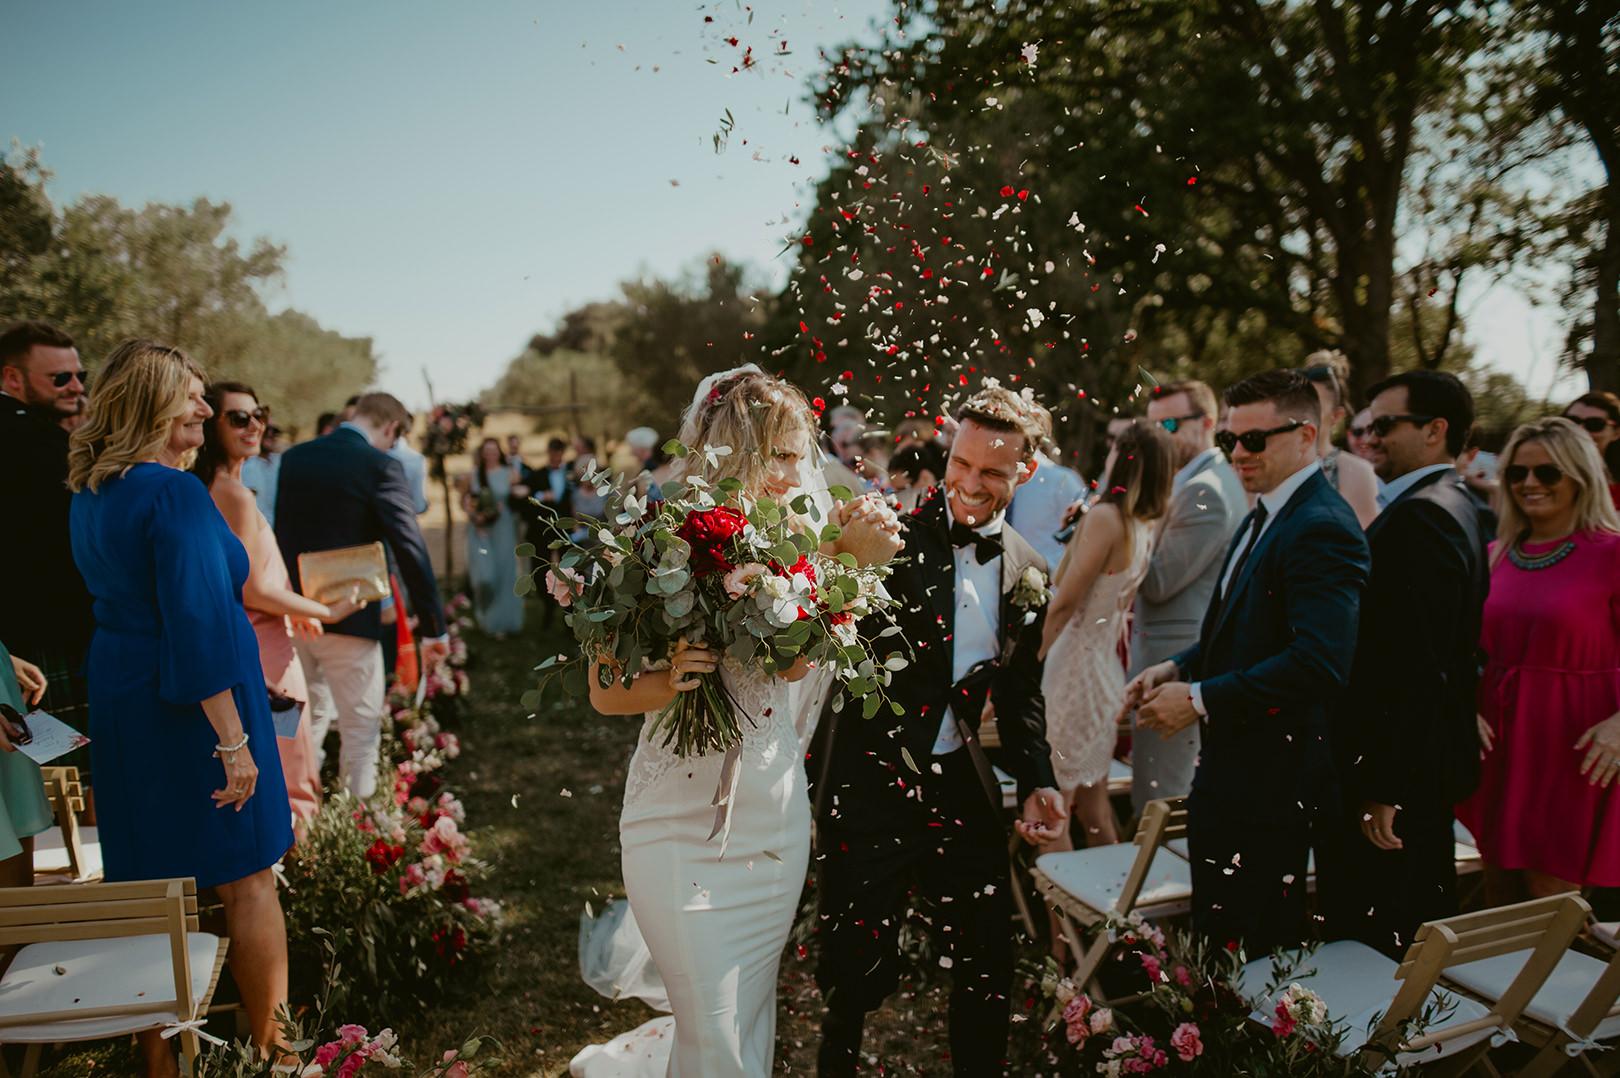 Happy celebration wedding photo